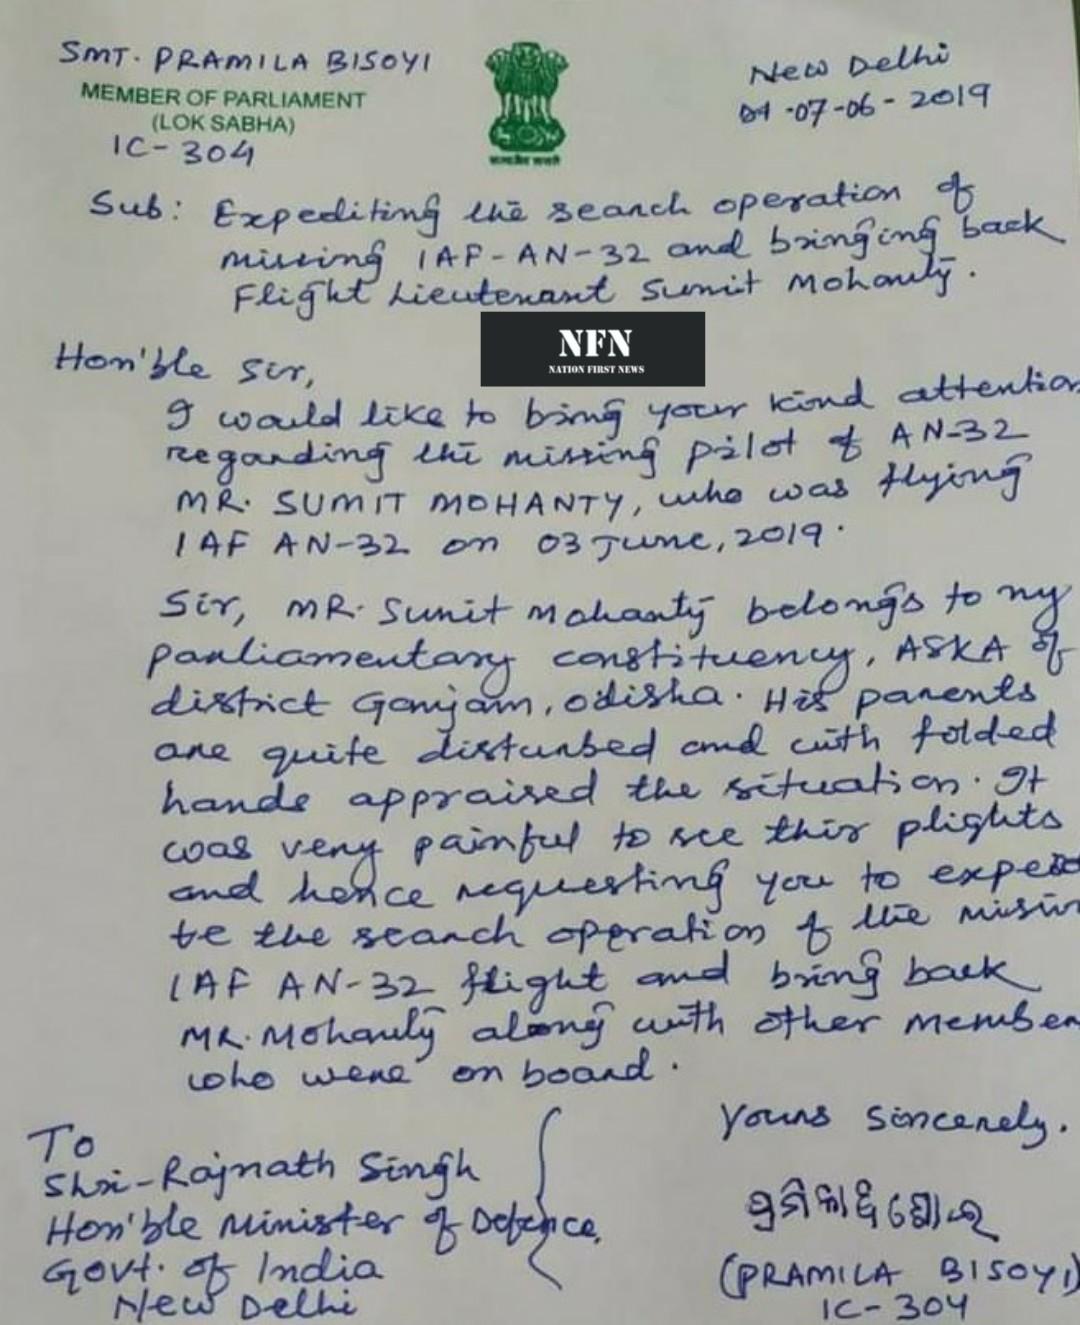 Pramila Bisoyi Letter